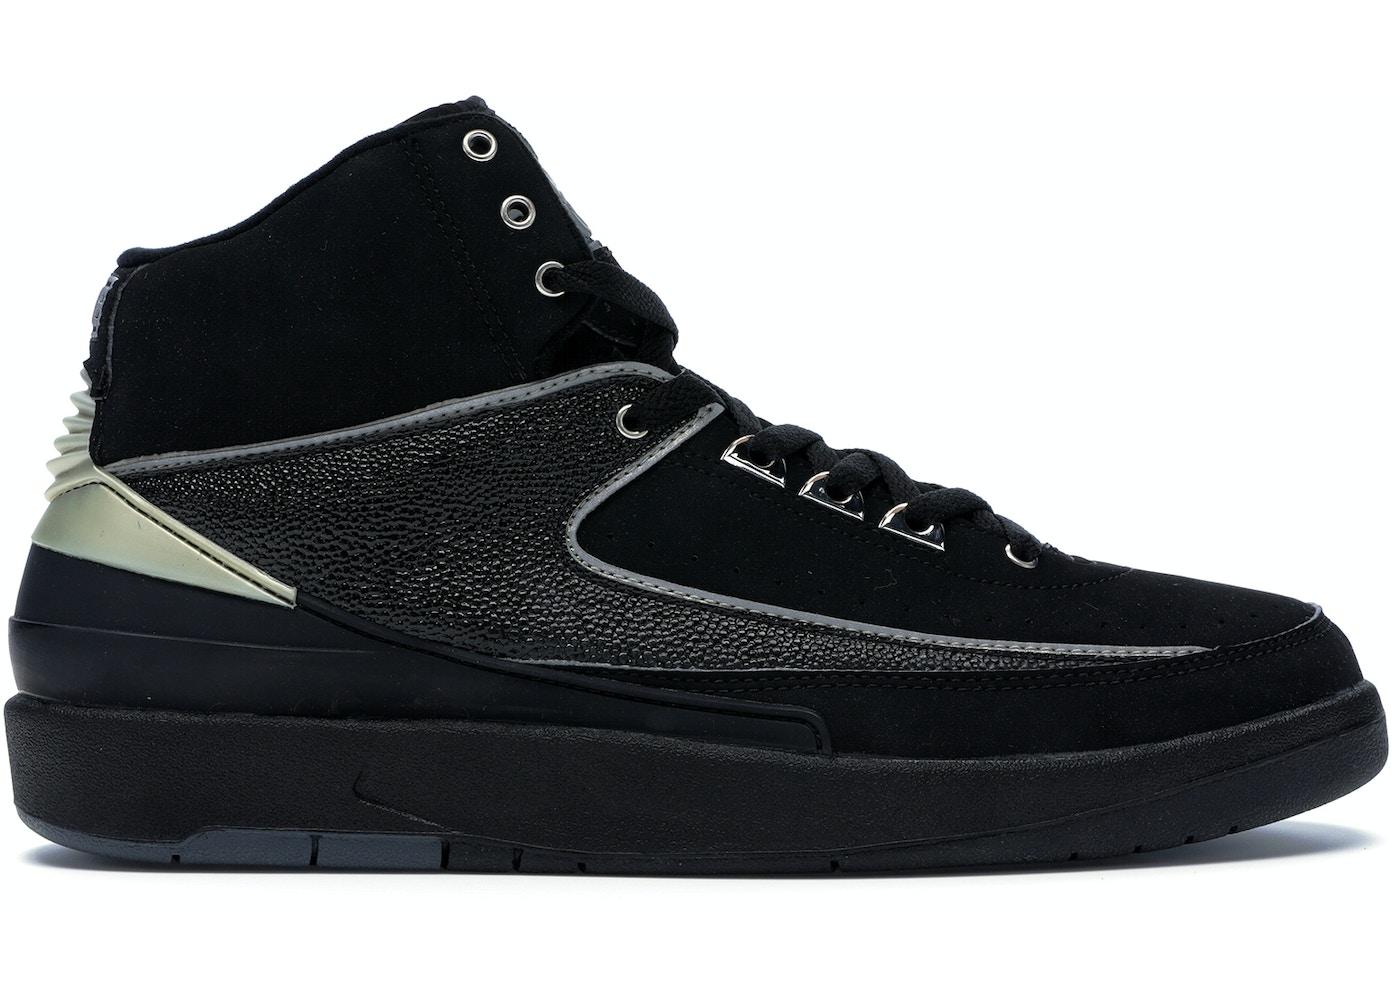 09cd363e736e Buy Air Jordan 2 Size 14 Shoes   Deadstock Sneakers